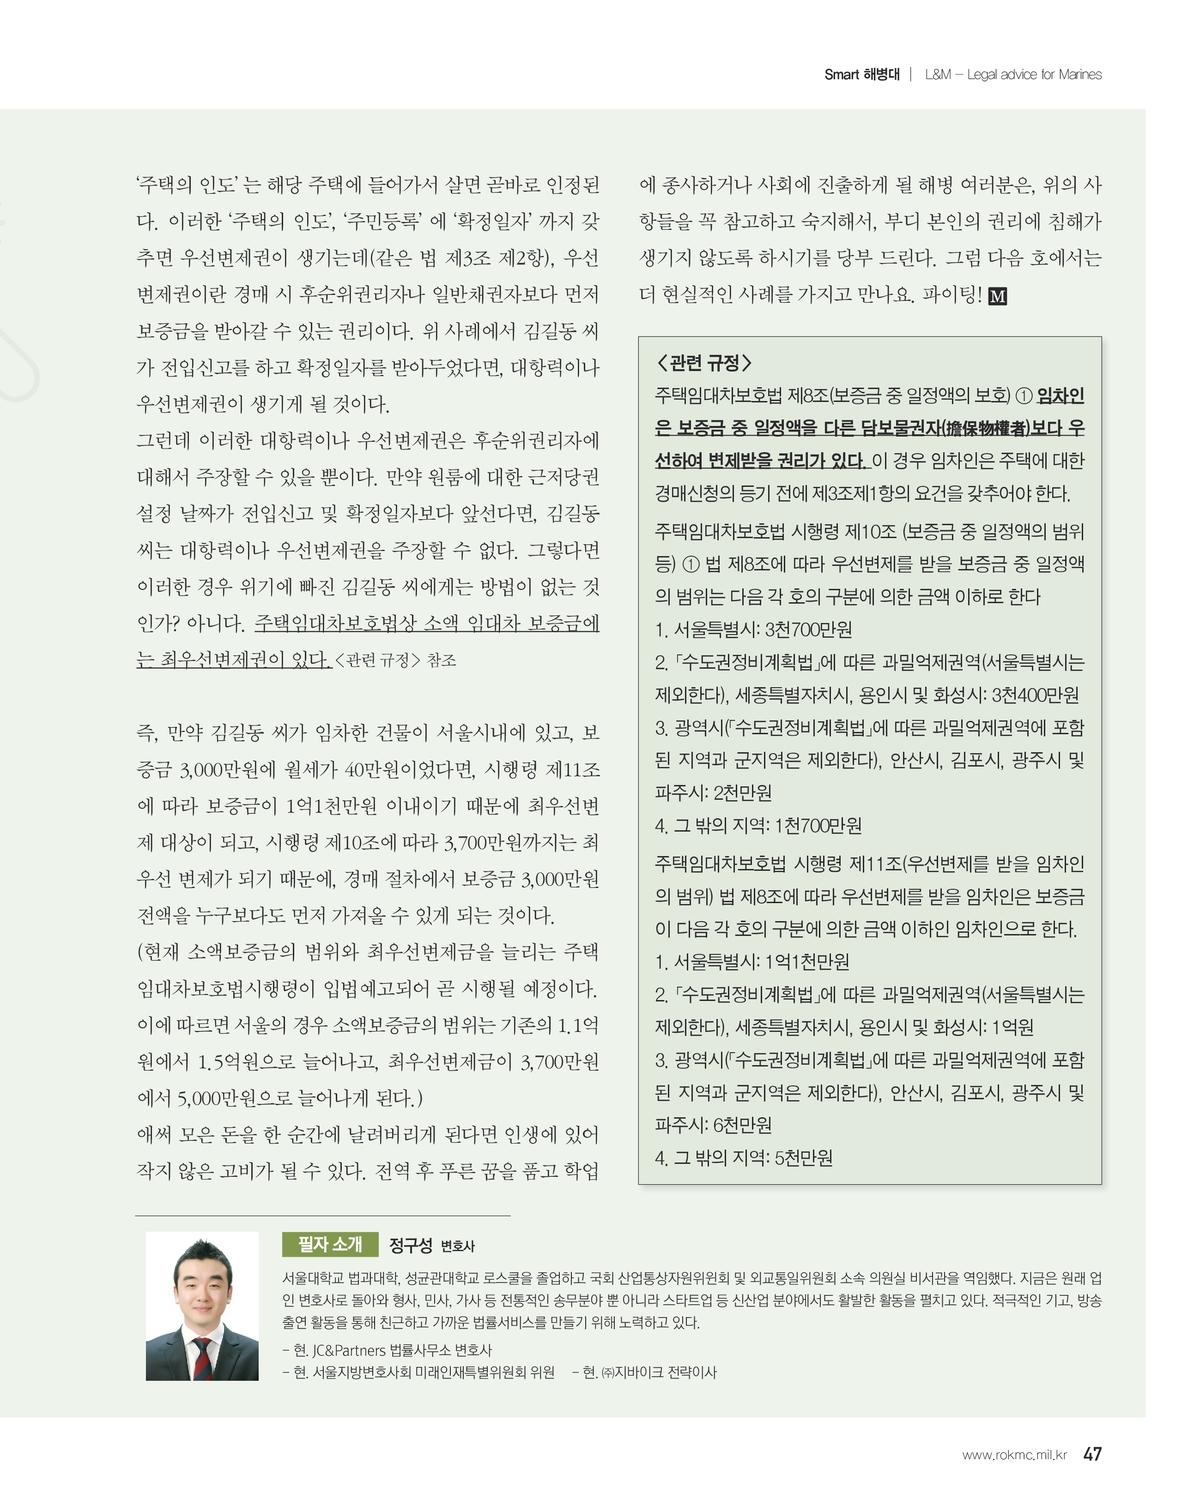 page-0515500000-49.jpg